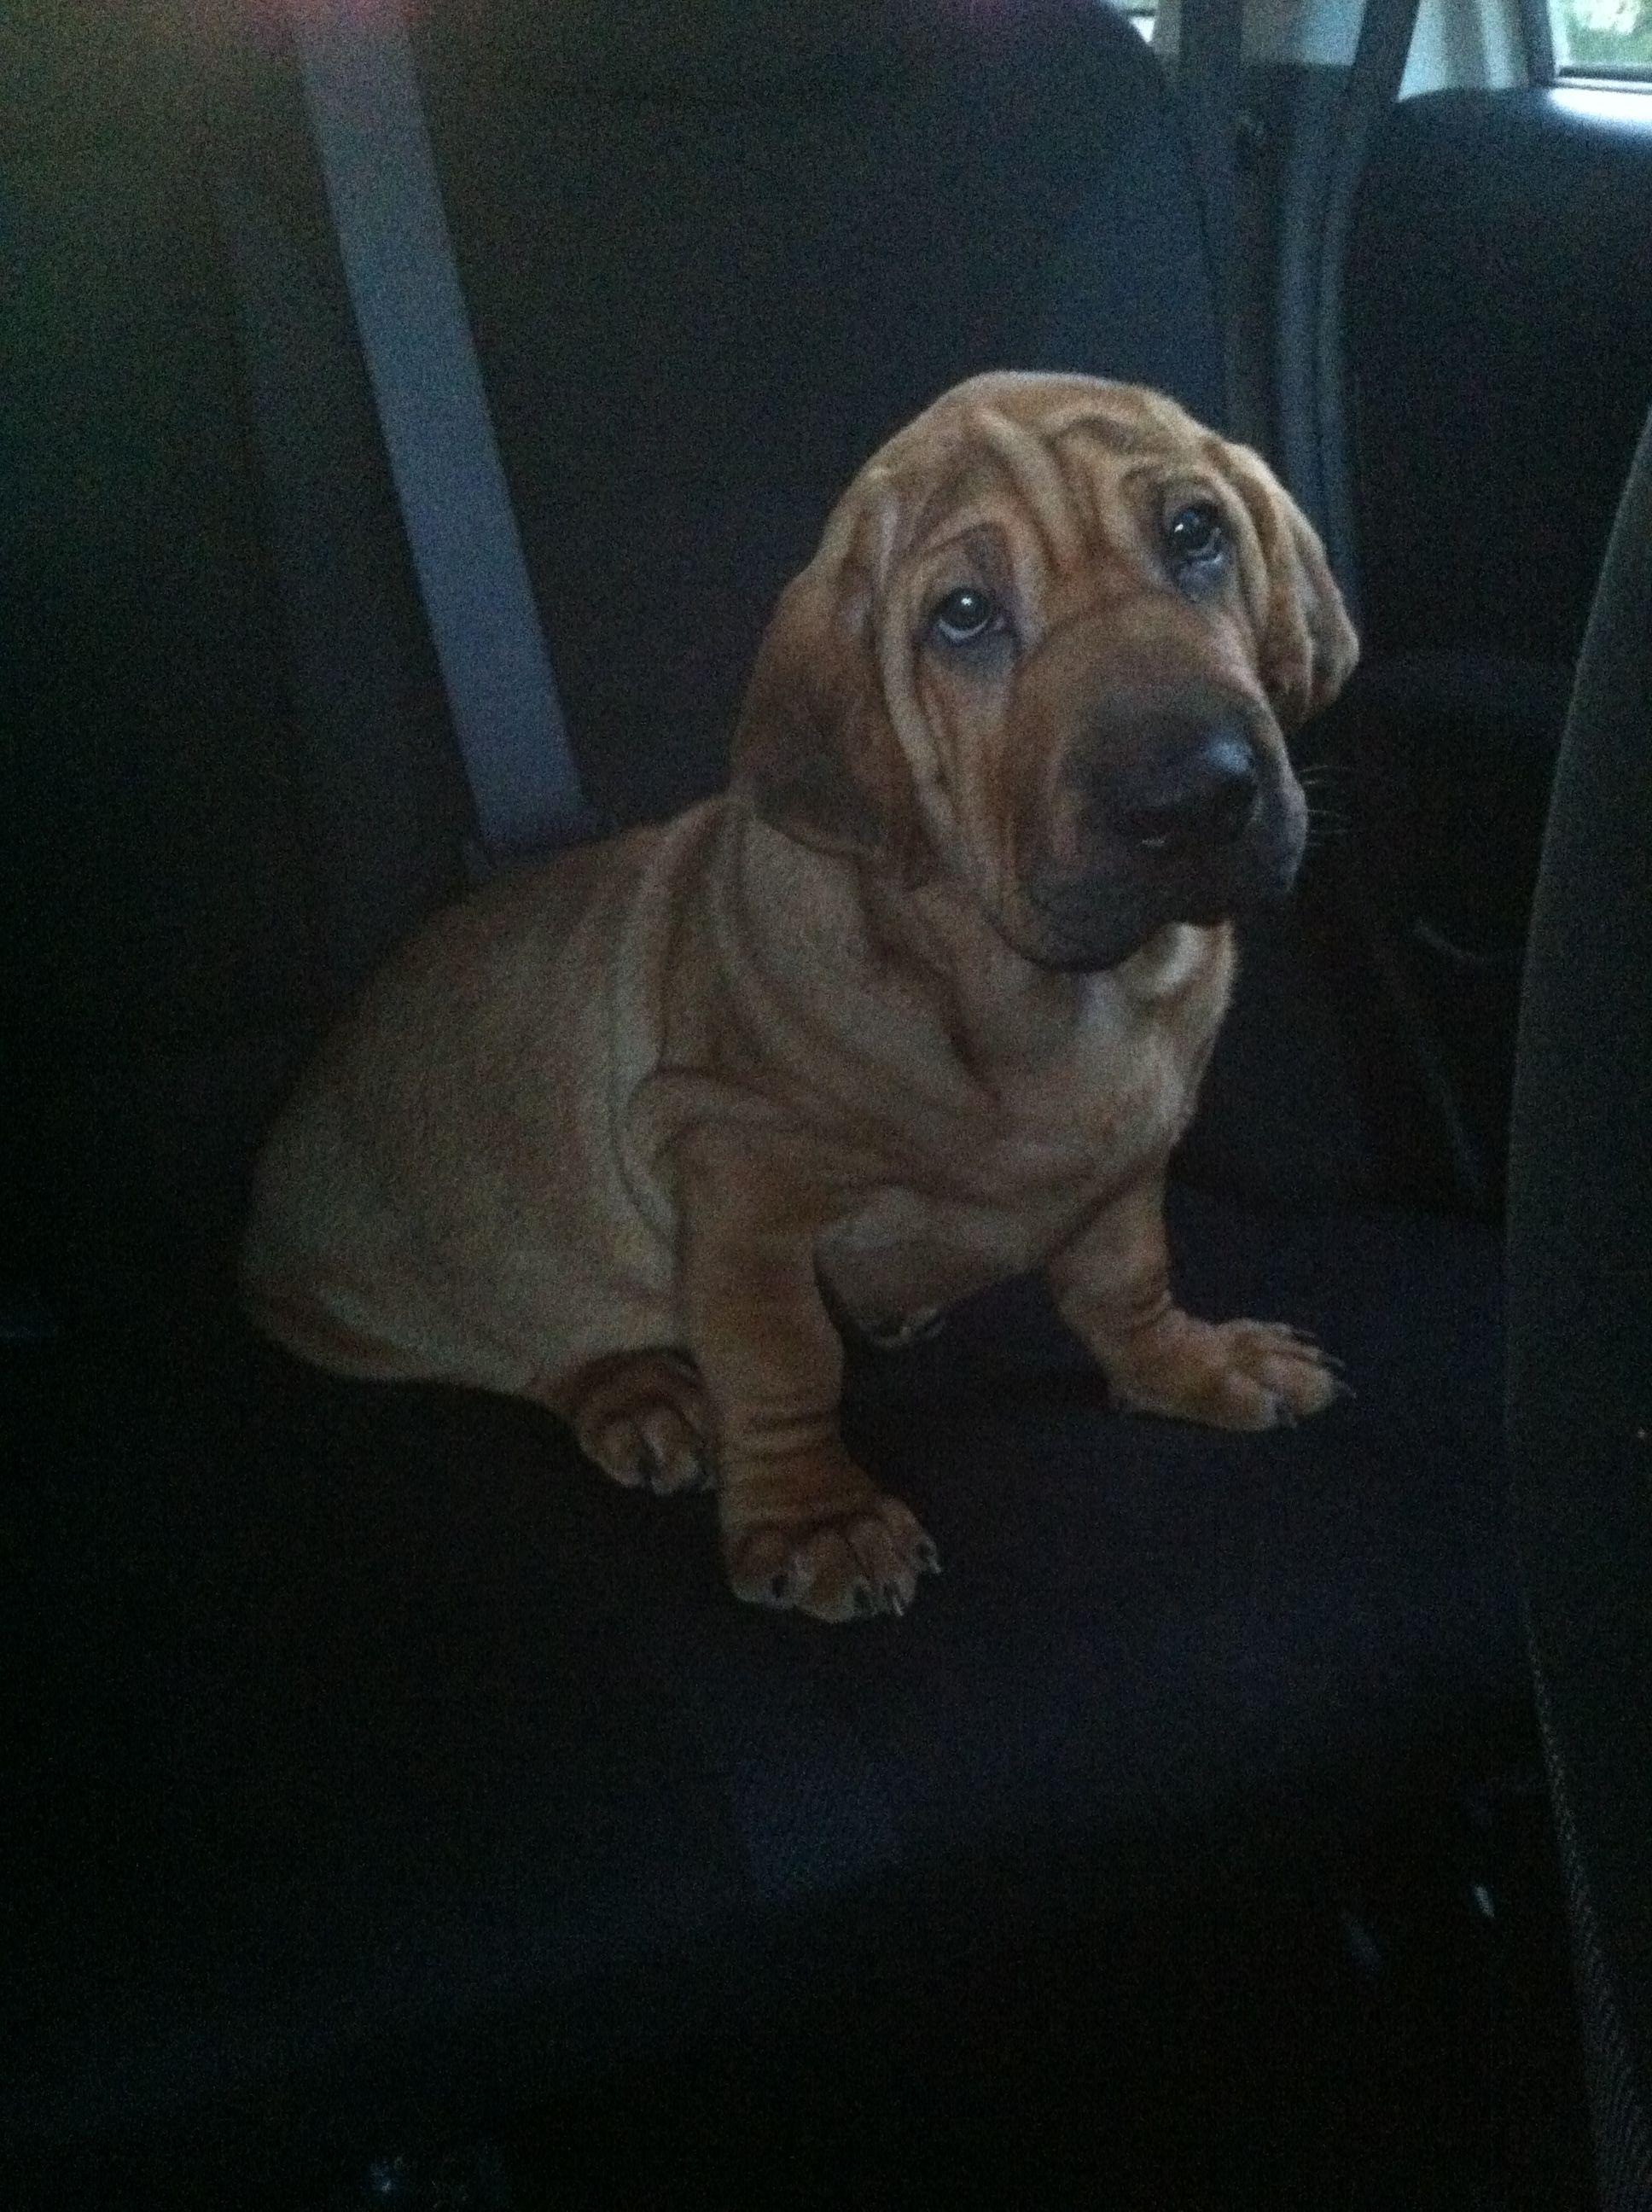 Great Shar Pei Chubby Adorable Dog - 3722526eeb2076ef0652a3e9c7f697f1  HD_607293  .jpg